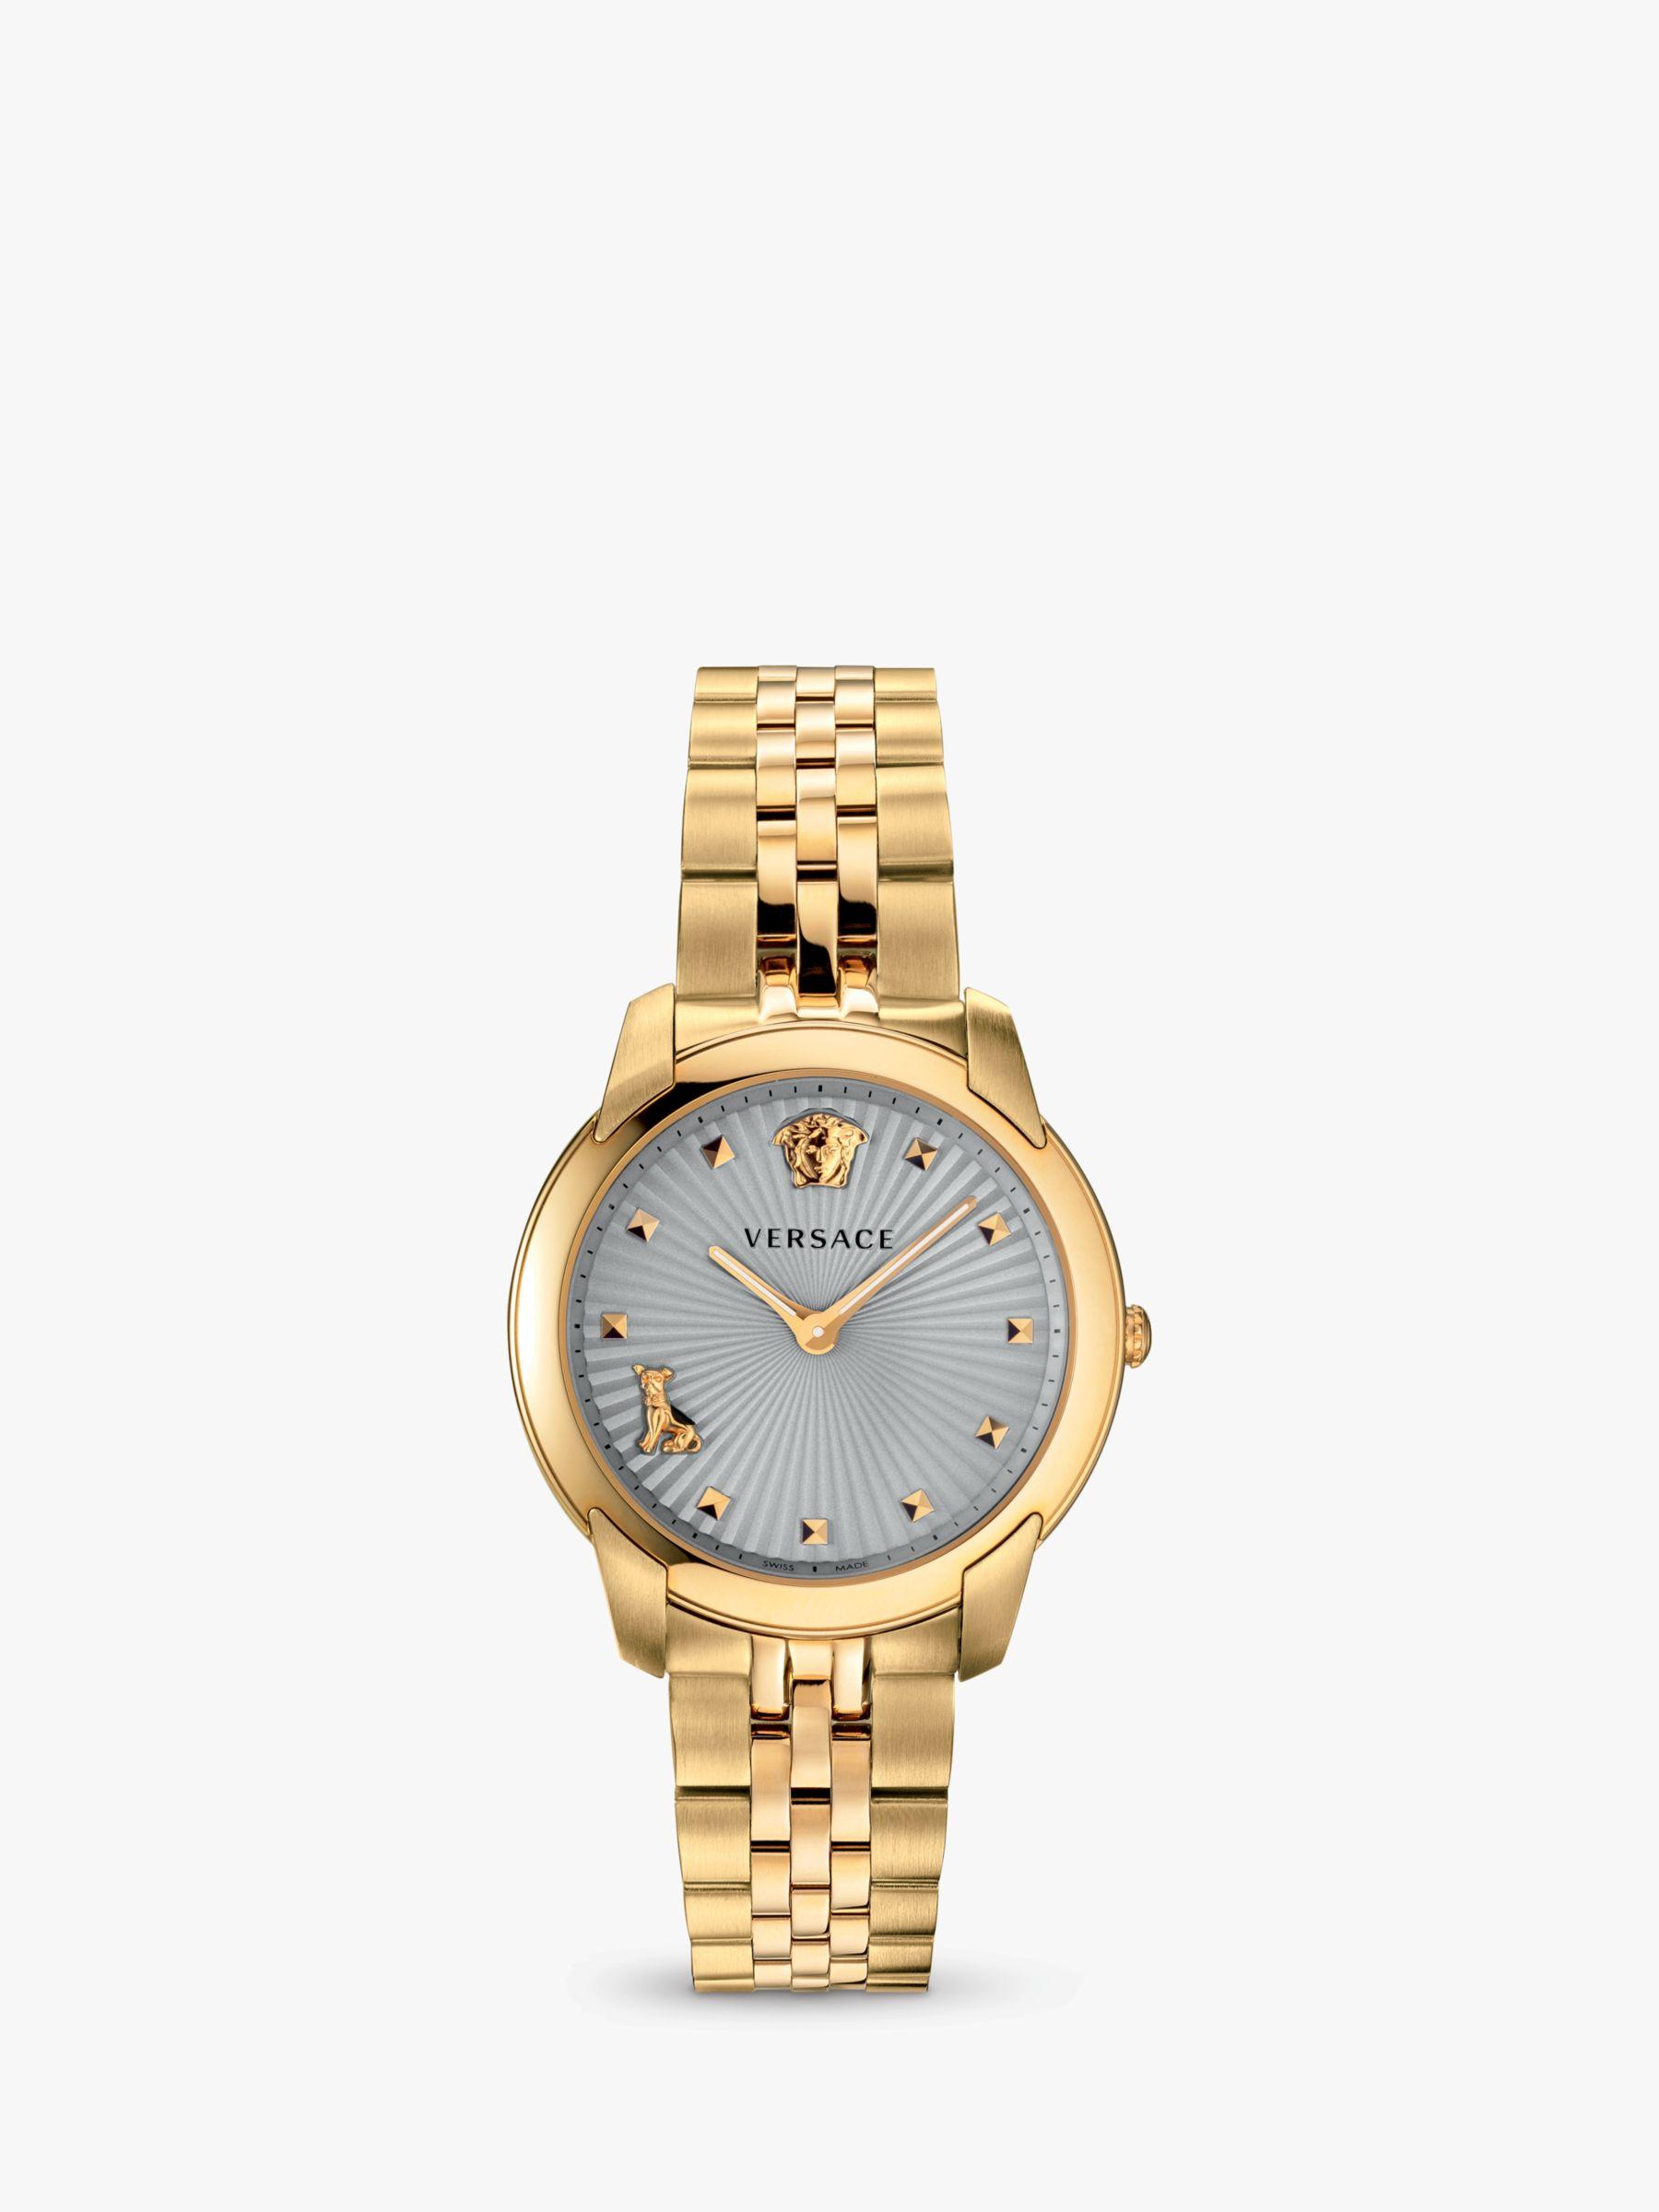 Versace Versace VELR00719 Women's Audrey Stud Detail Chain Strap Watch, Gold